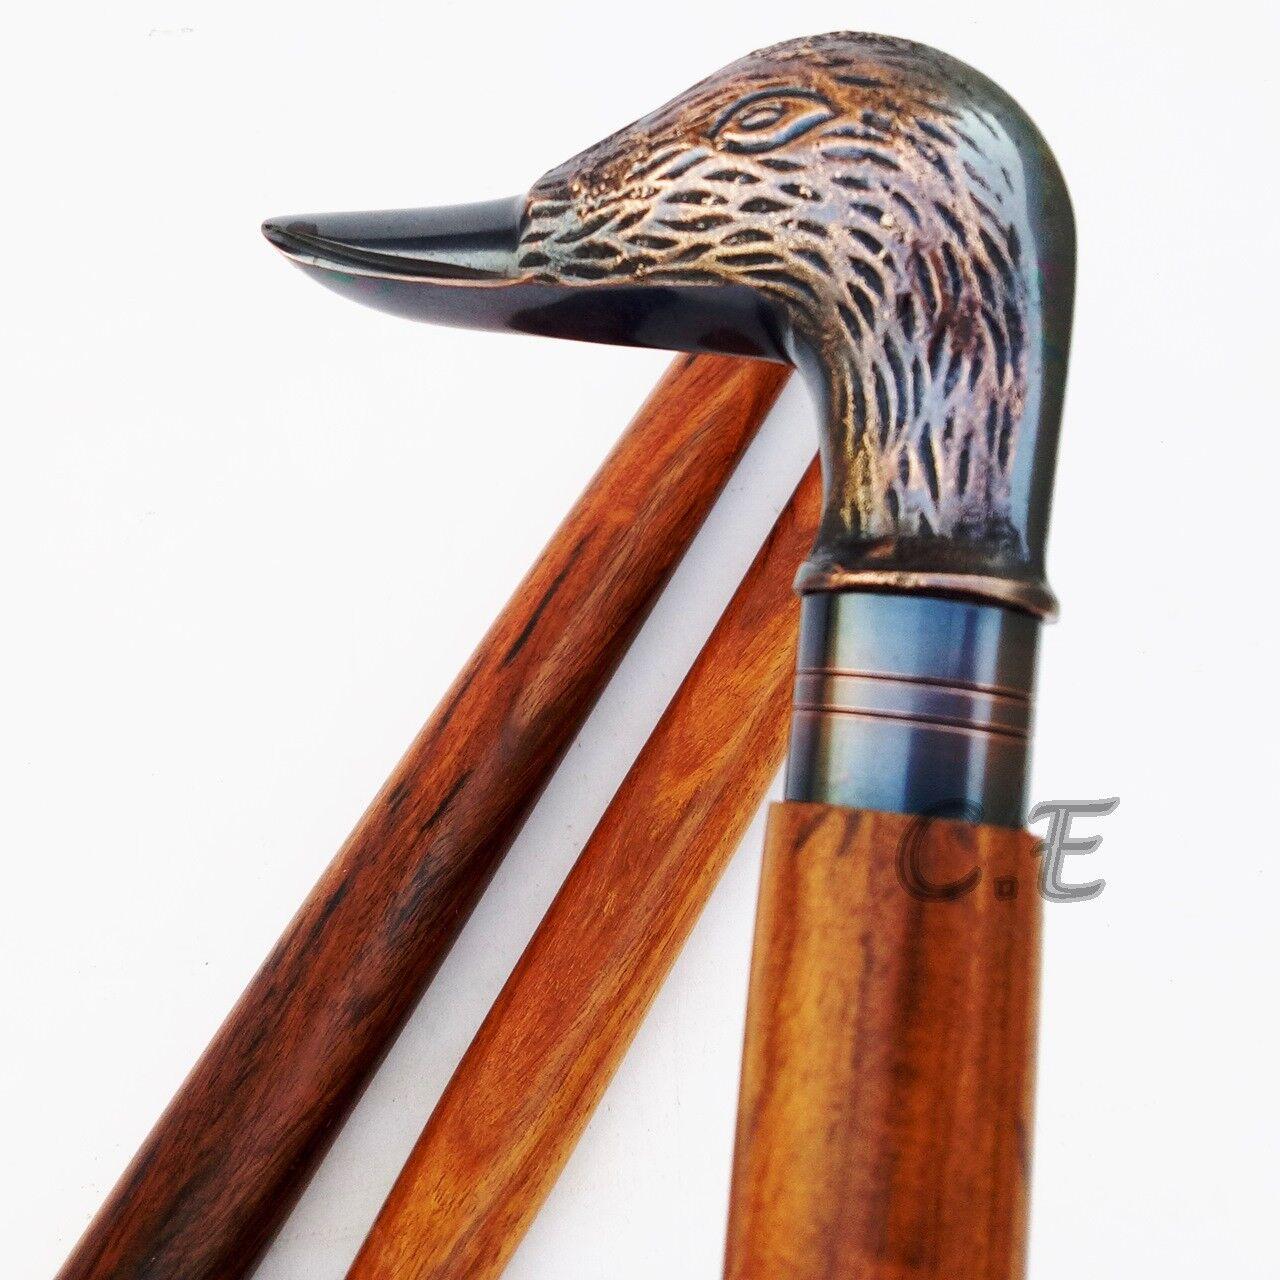 Vintage Antique Duck Head Walking Cane Wooden Walking Stick Brass Handle Gifts